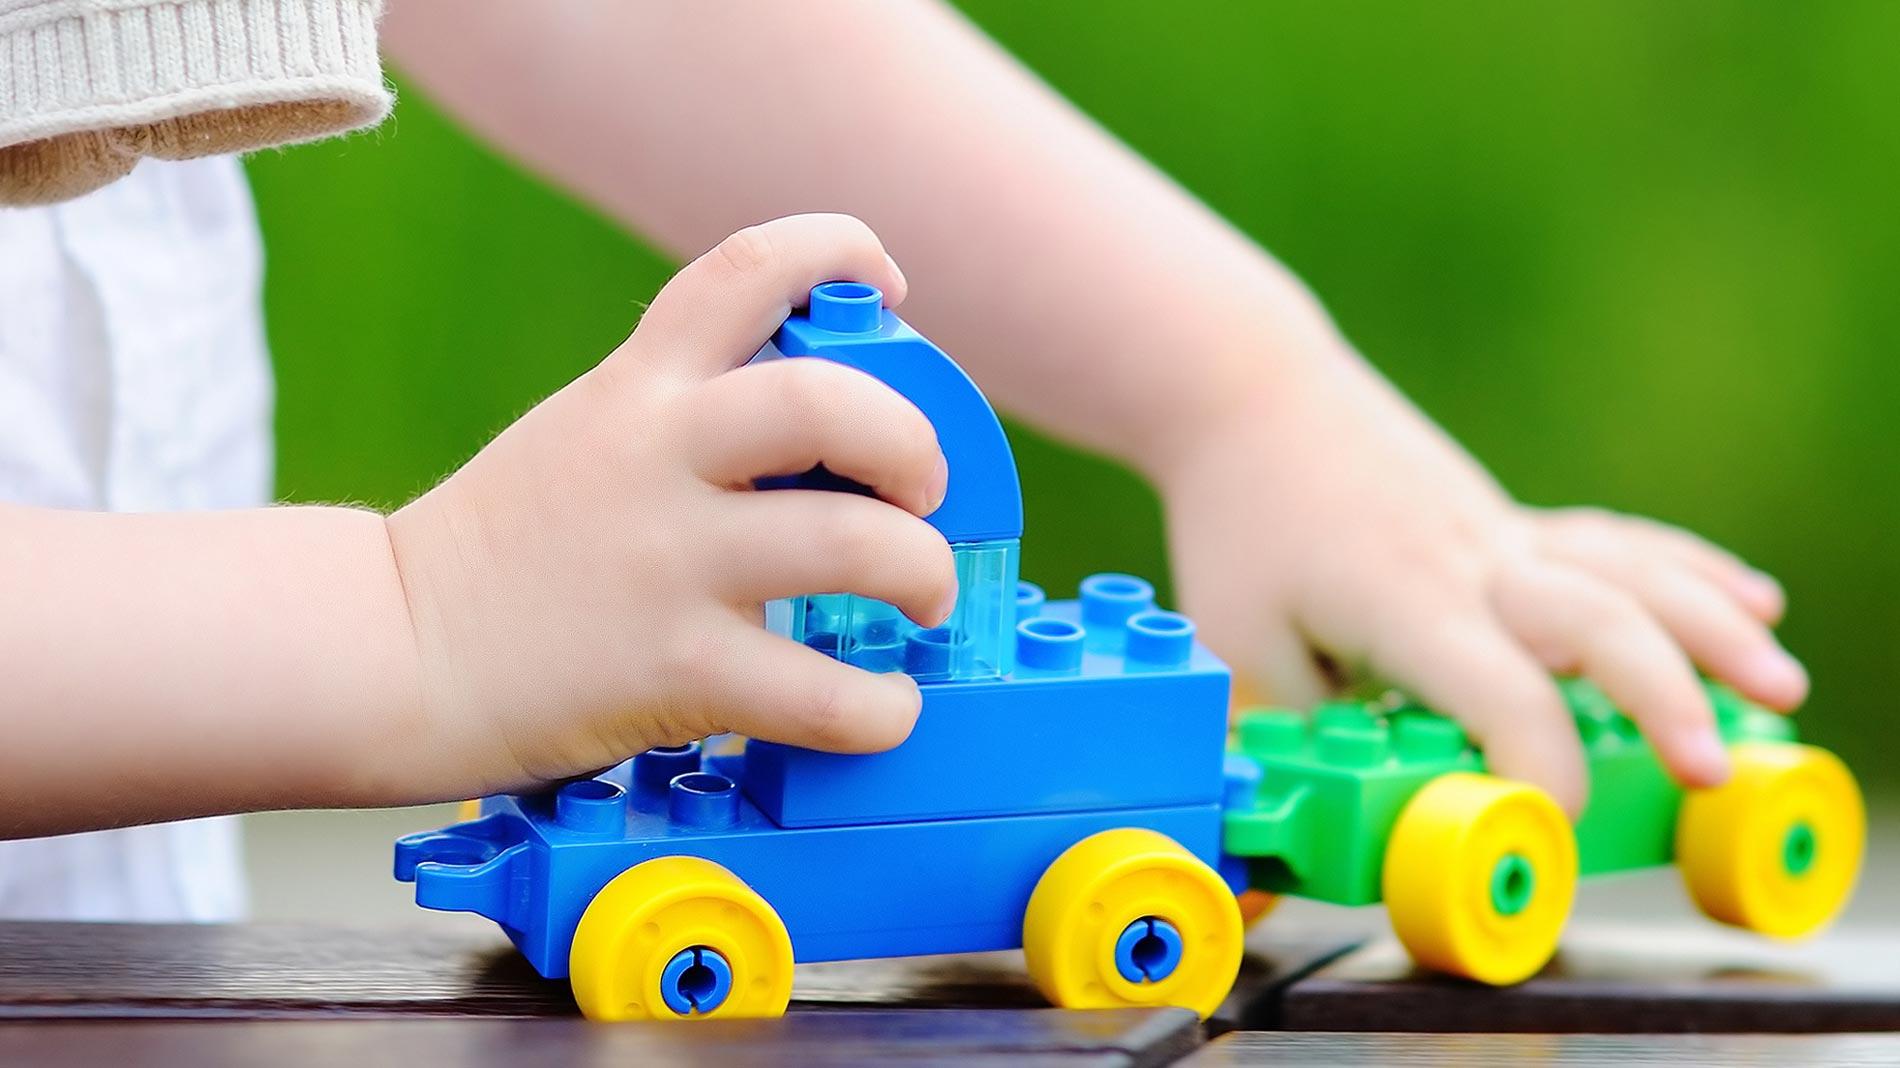 Niños \'influencers\' de juguetes en Youtube - RTVE.es